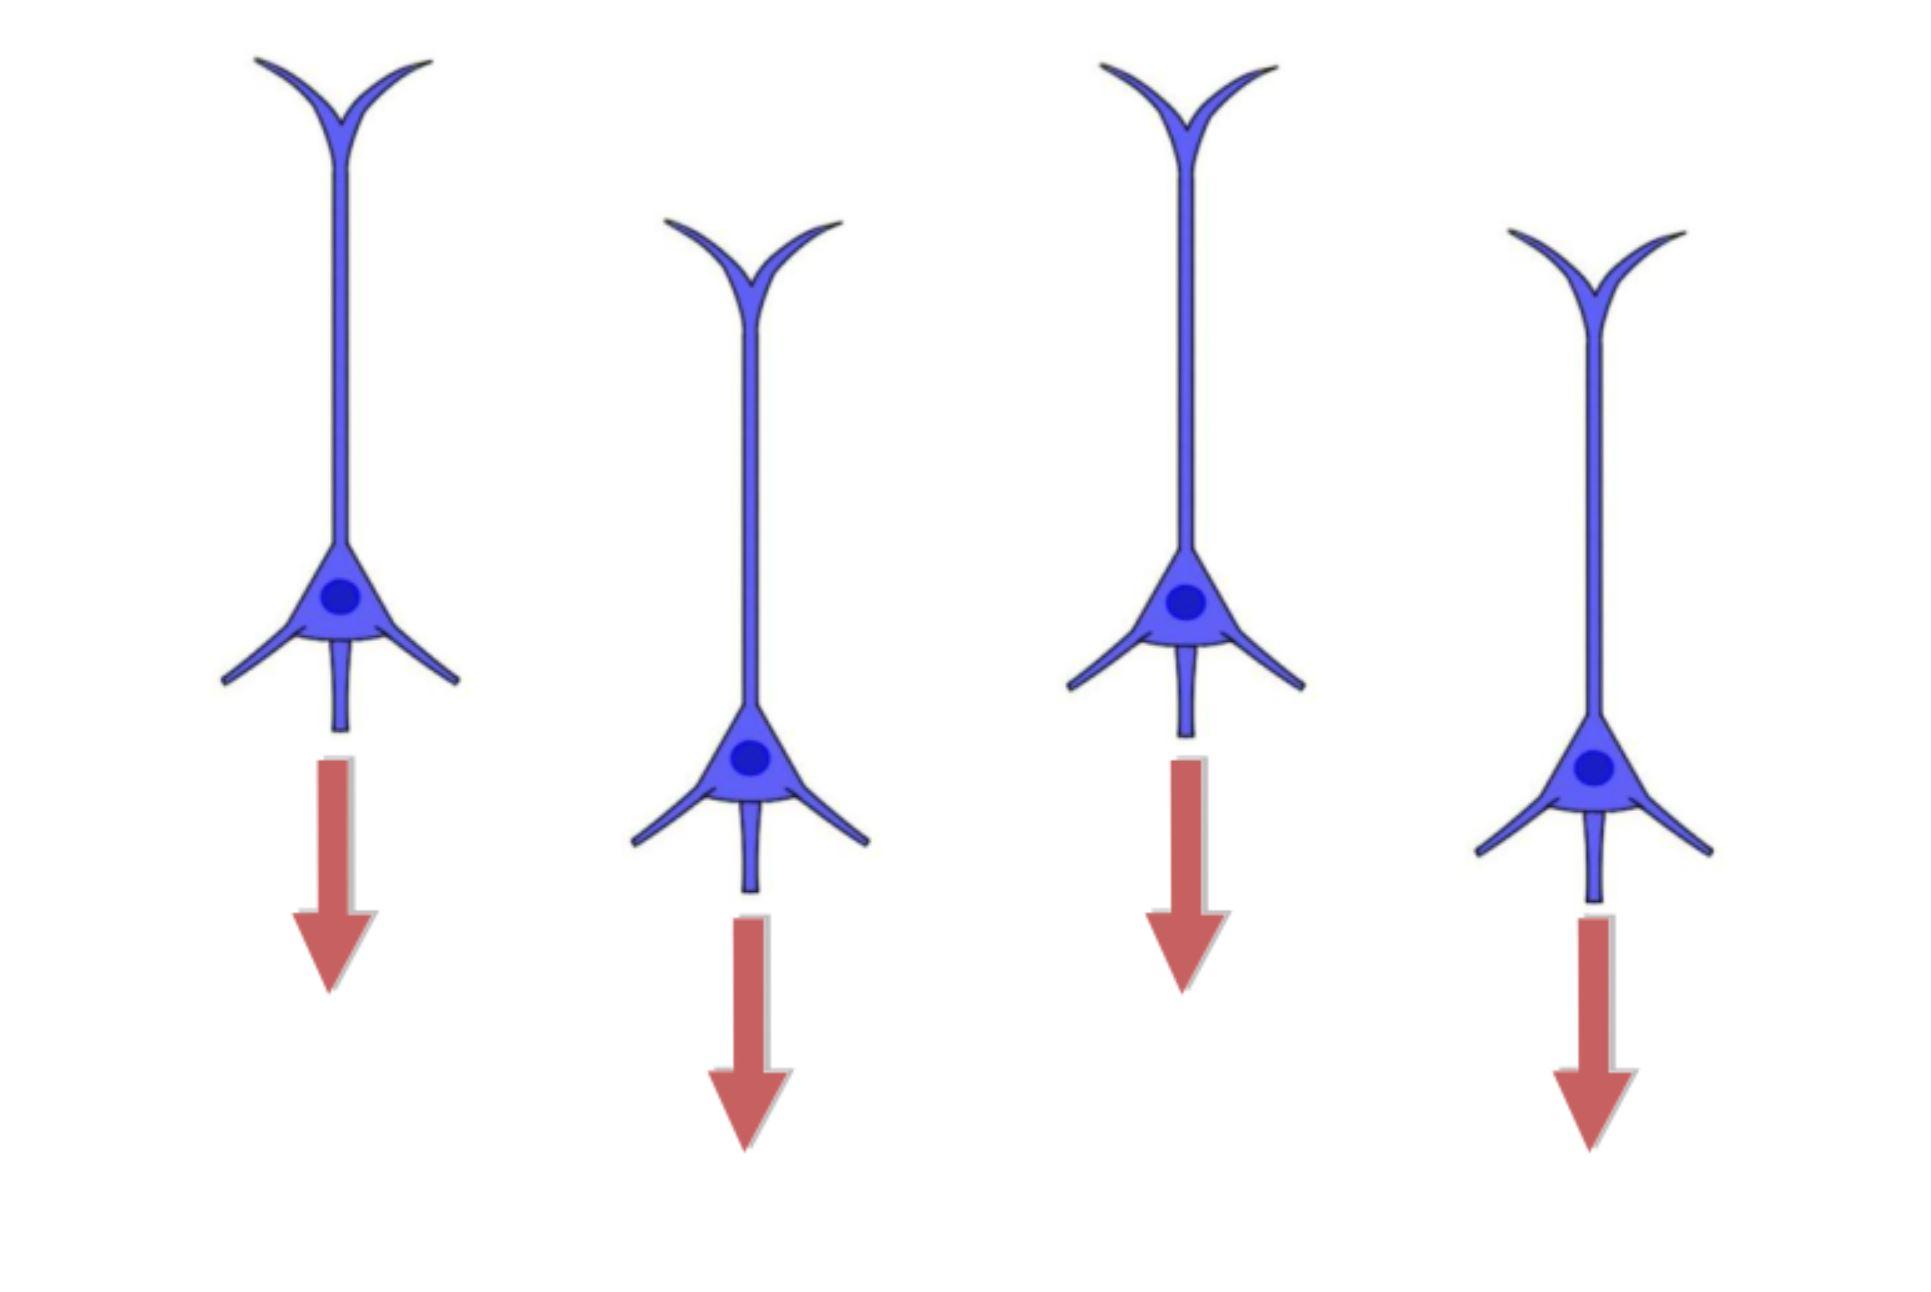 "2-Minute Neuroscience<a href=""/blog/2-minute-neuroscience-epilepsy"">→</a><strong>Epilepsy</strong>"